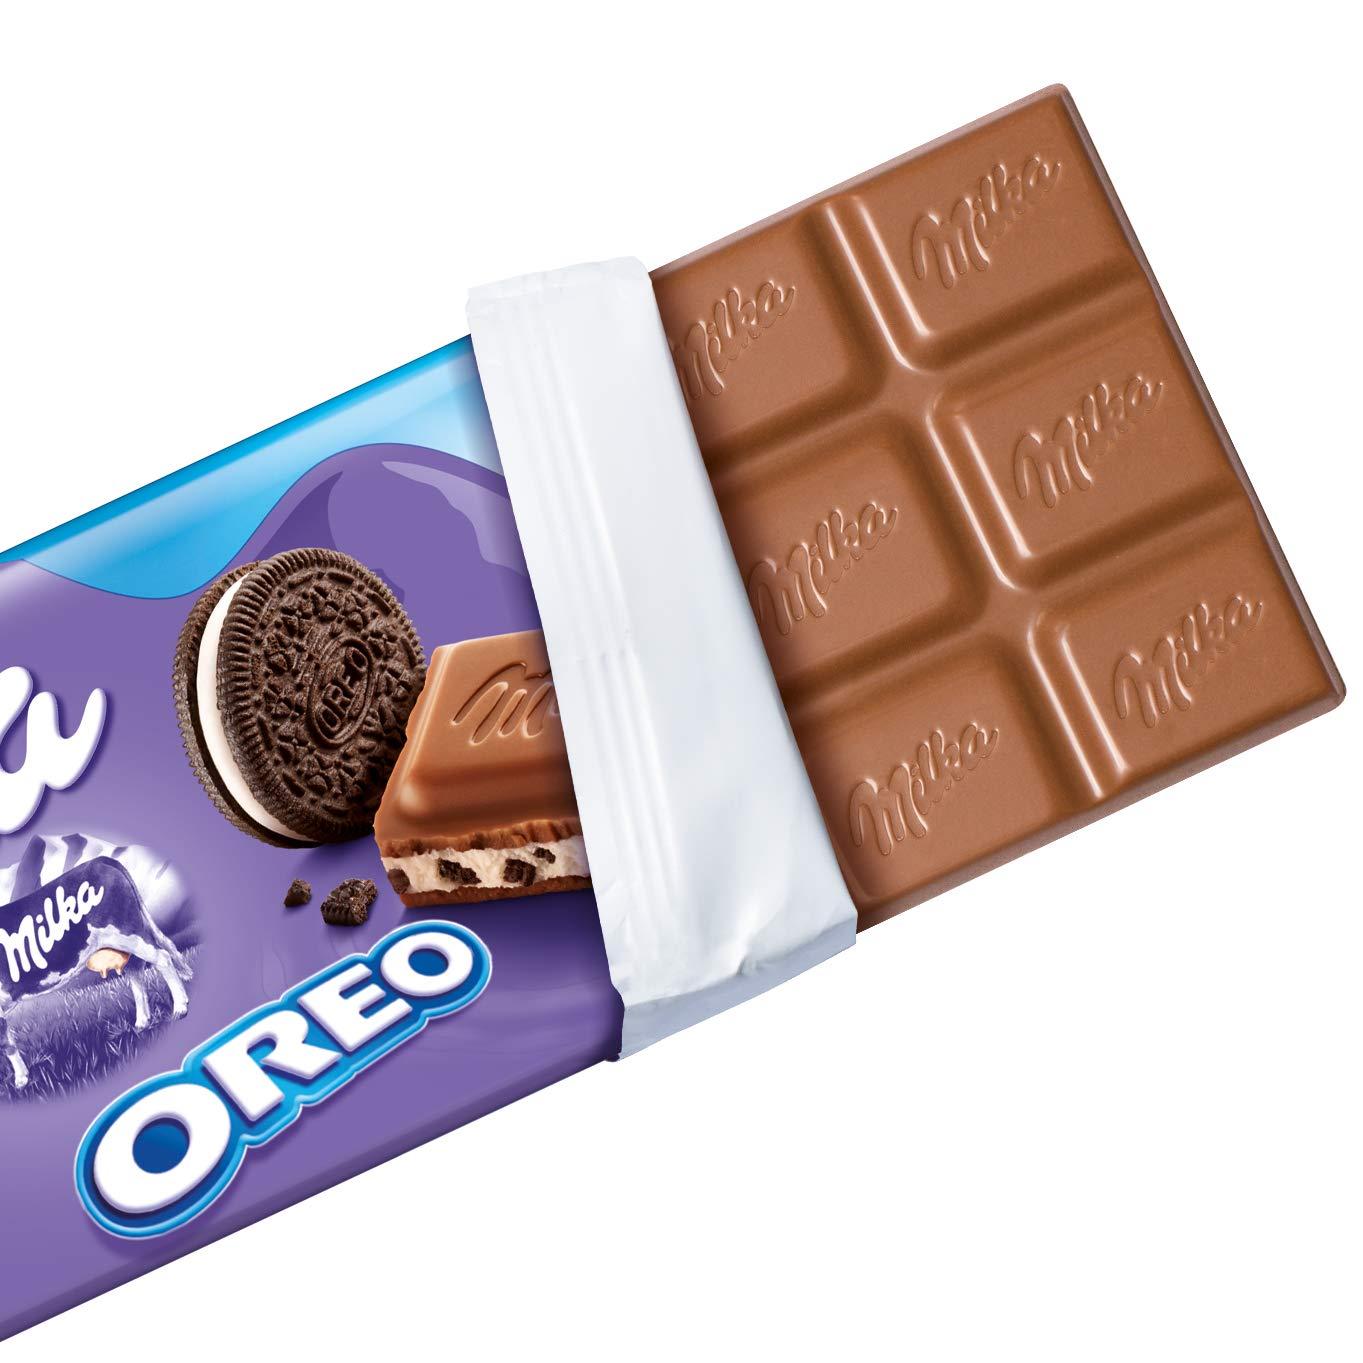 [amazon.de] Milka & Oreo 22x100g za 17,97€